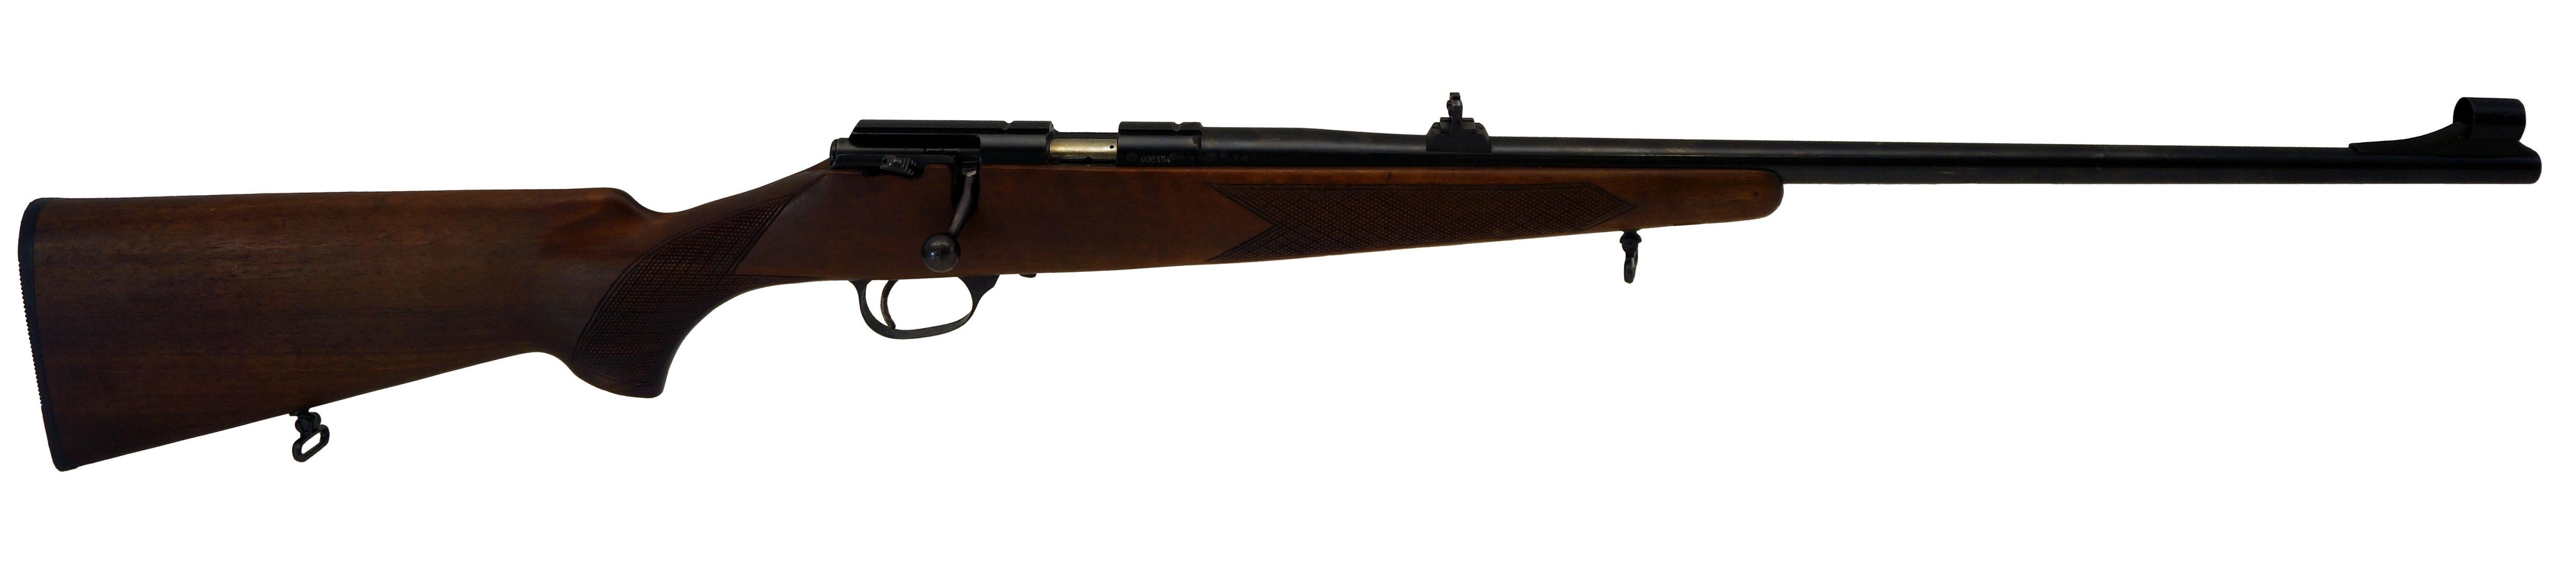 Zastava CZ99 Precision, .22LR, No Magazine, *Excellent*